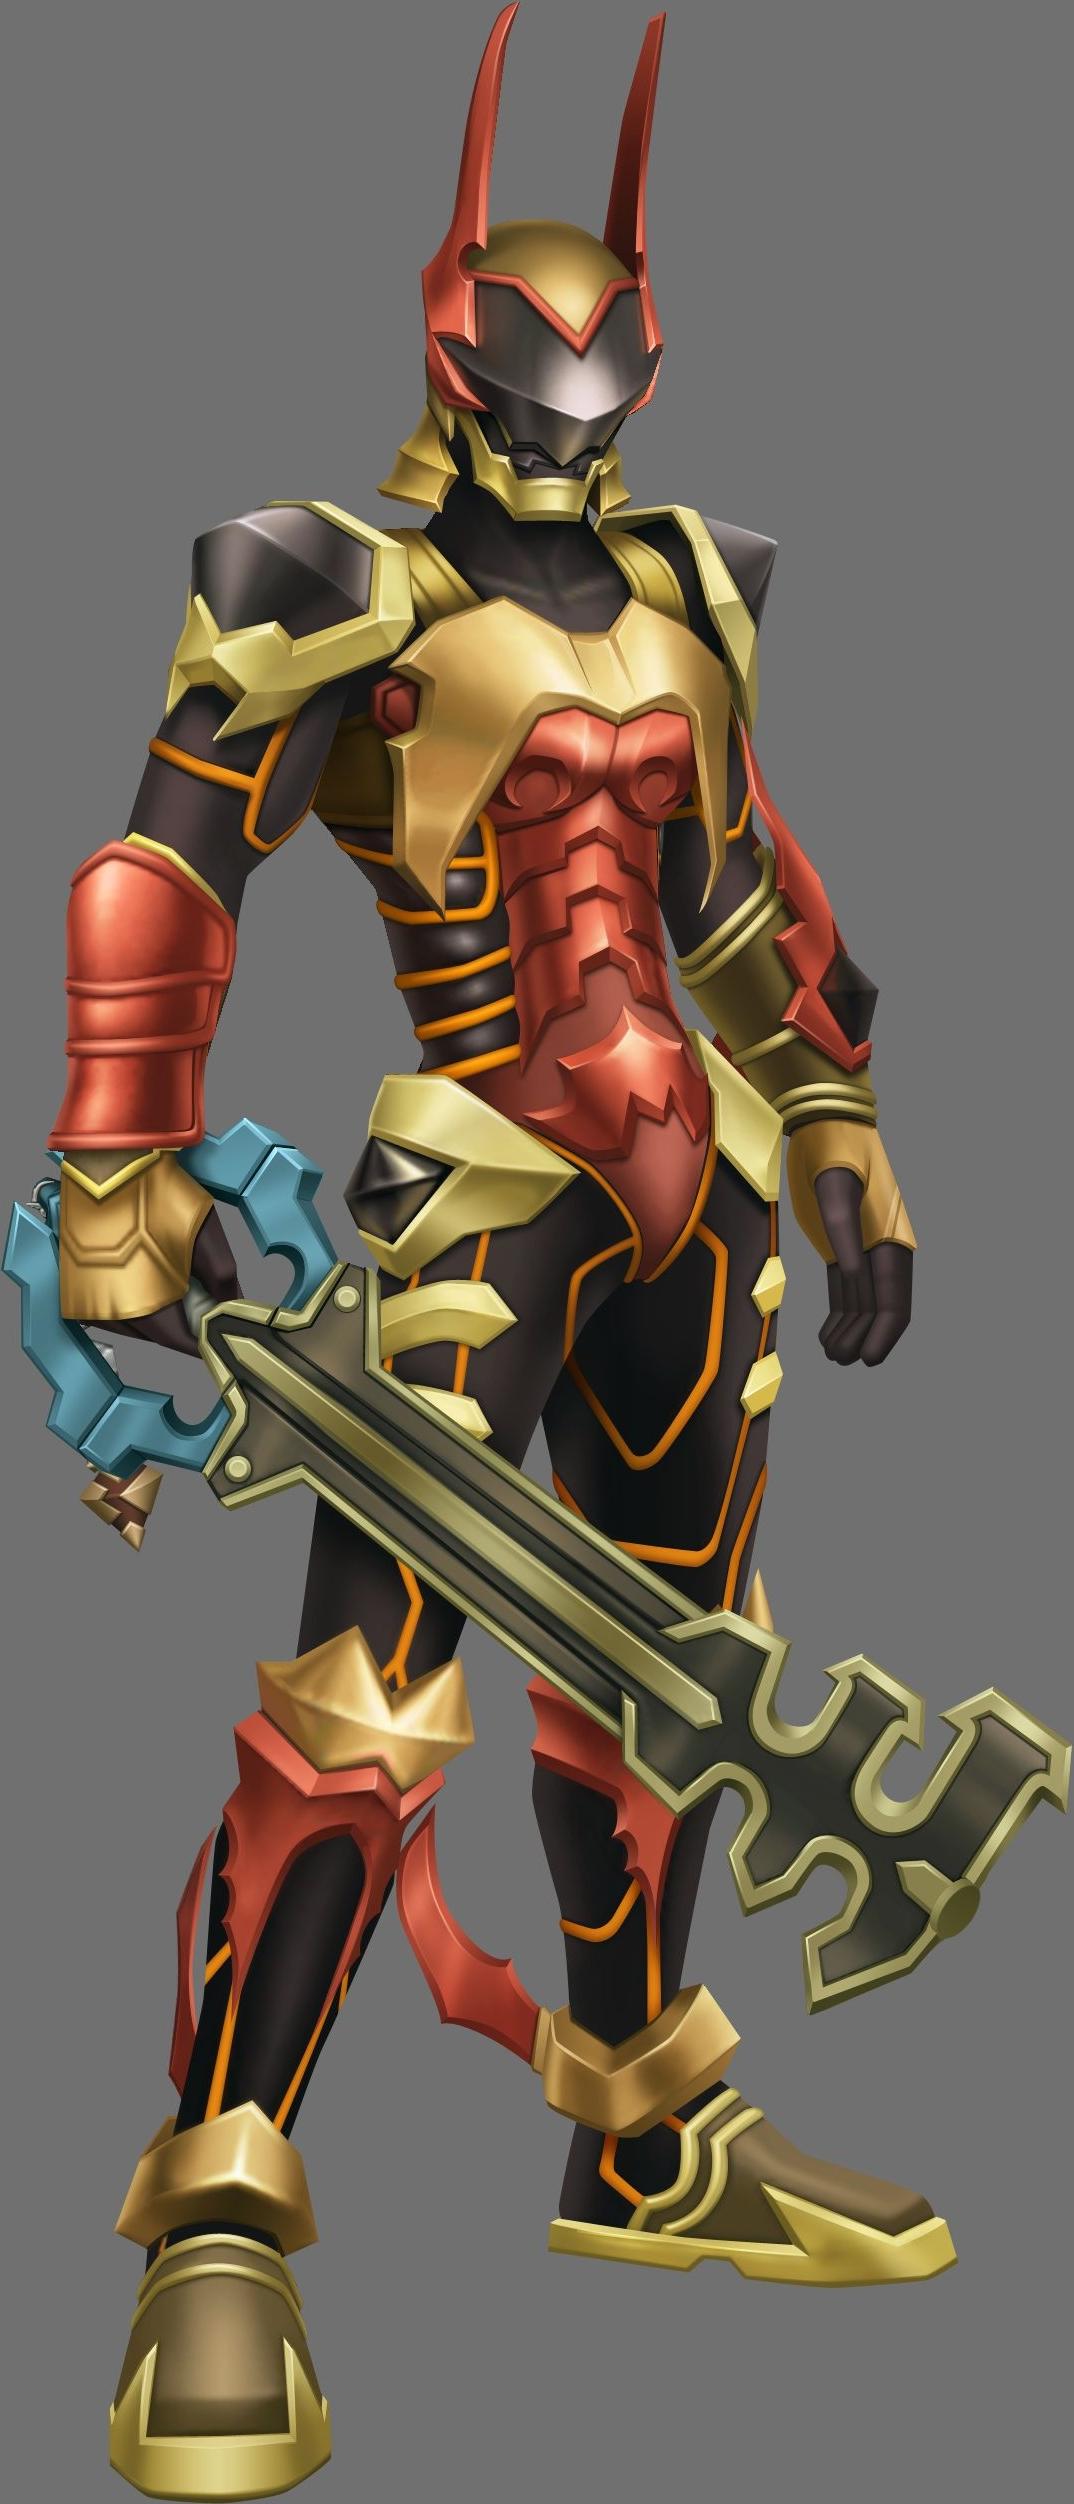 Kingdom Hearts/Kingdom Hearts 2 Keyblade Weapons - Skyrim ...  Kingdom Hearts/...